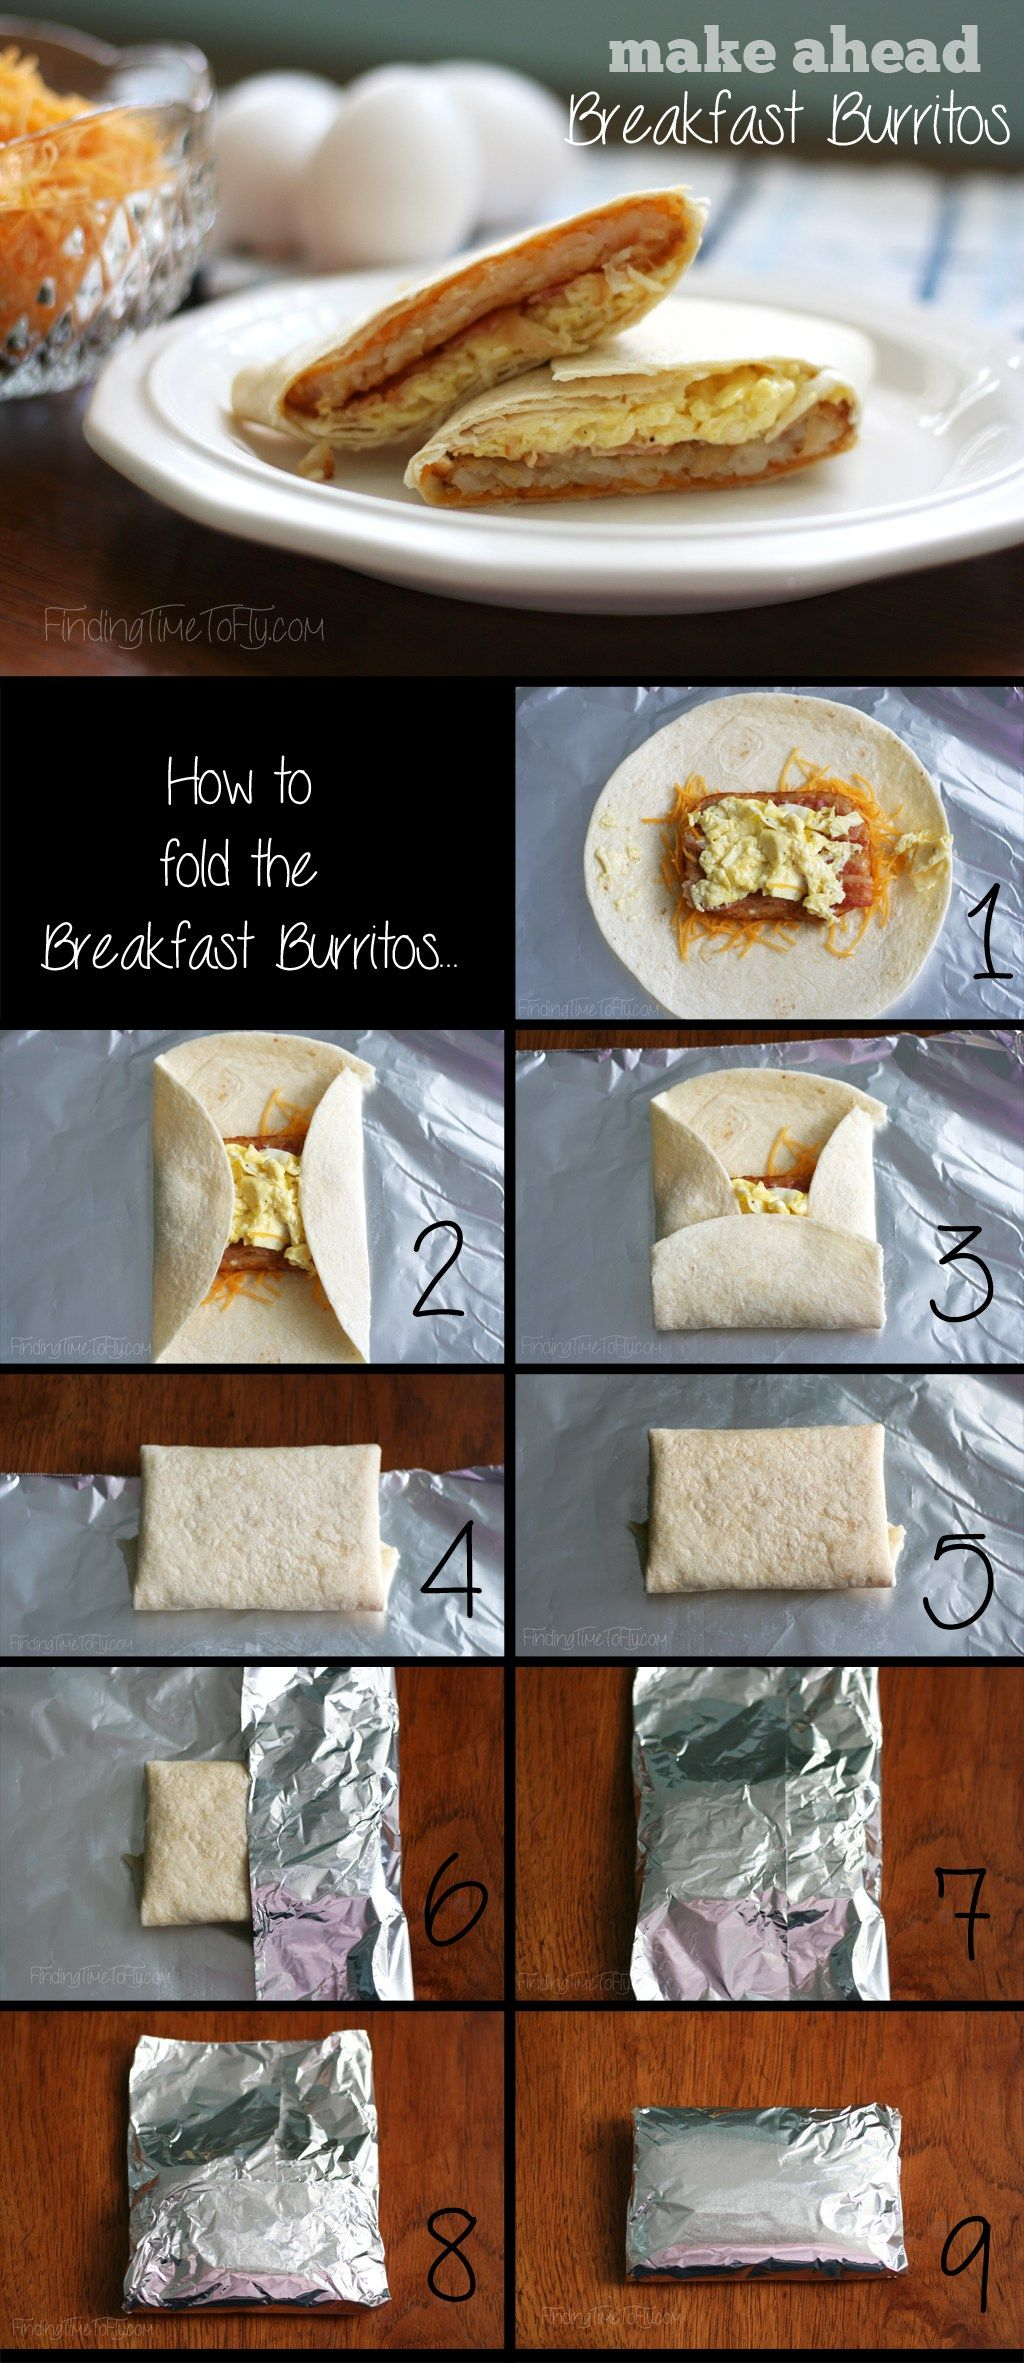 Make Ahead Breakfast Burritos Recipe Make Ahead Breakfast Burritos Camping Breakfast Burritos Make Ahead Breakfast